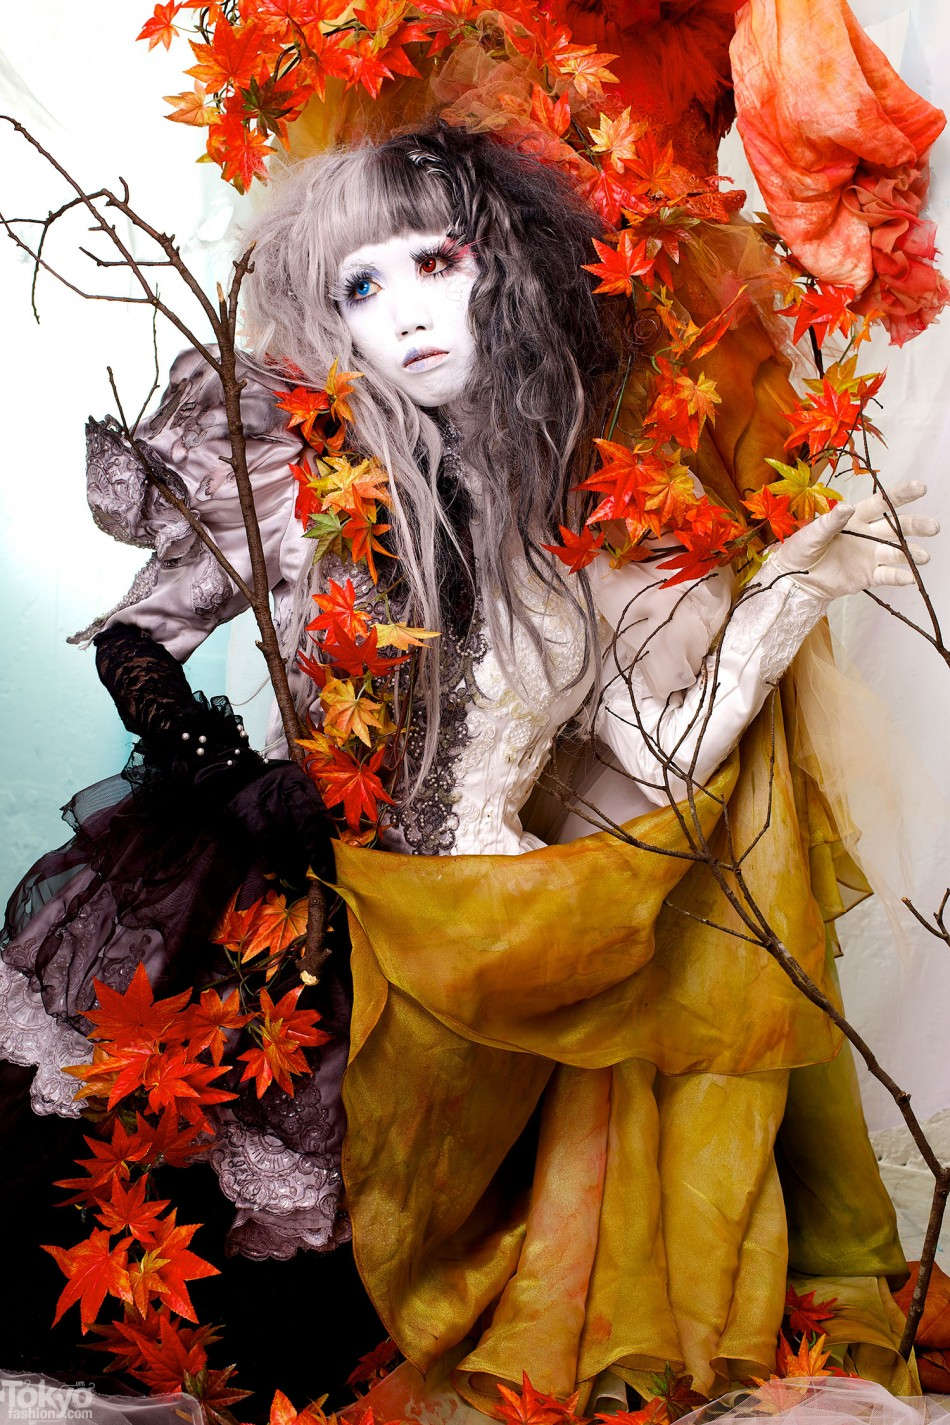 Minori - Her Memories of a Dream (14)